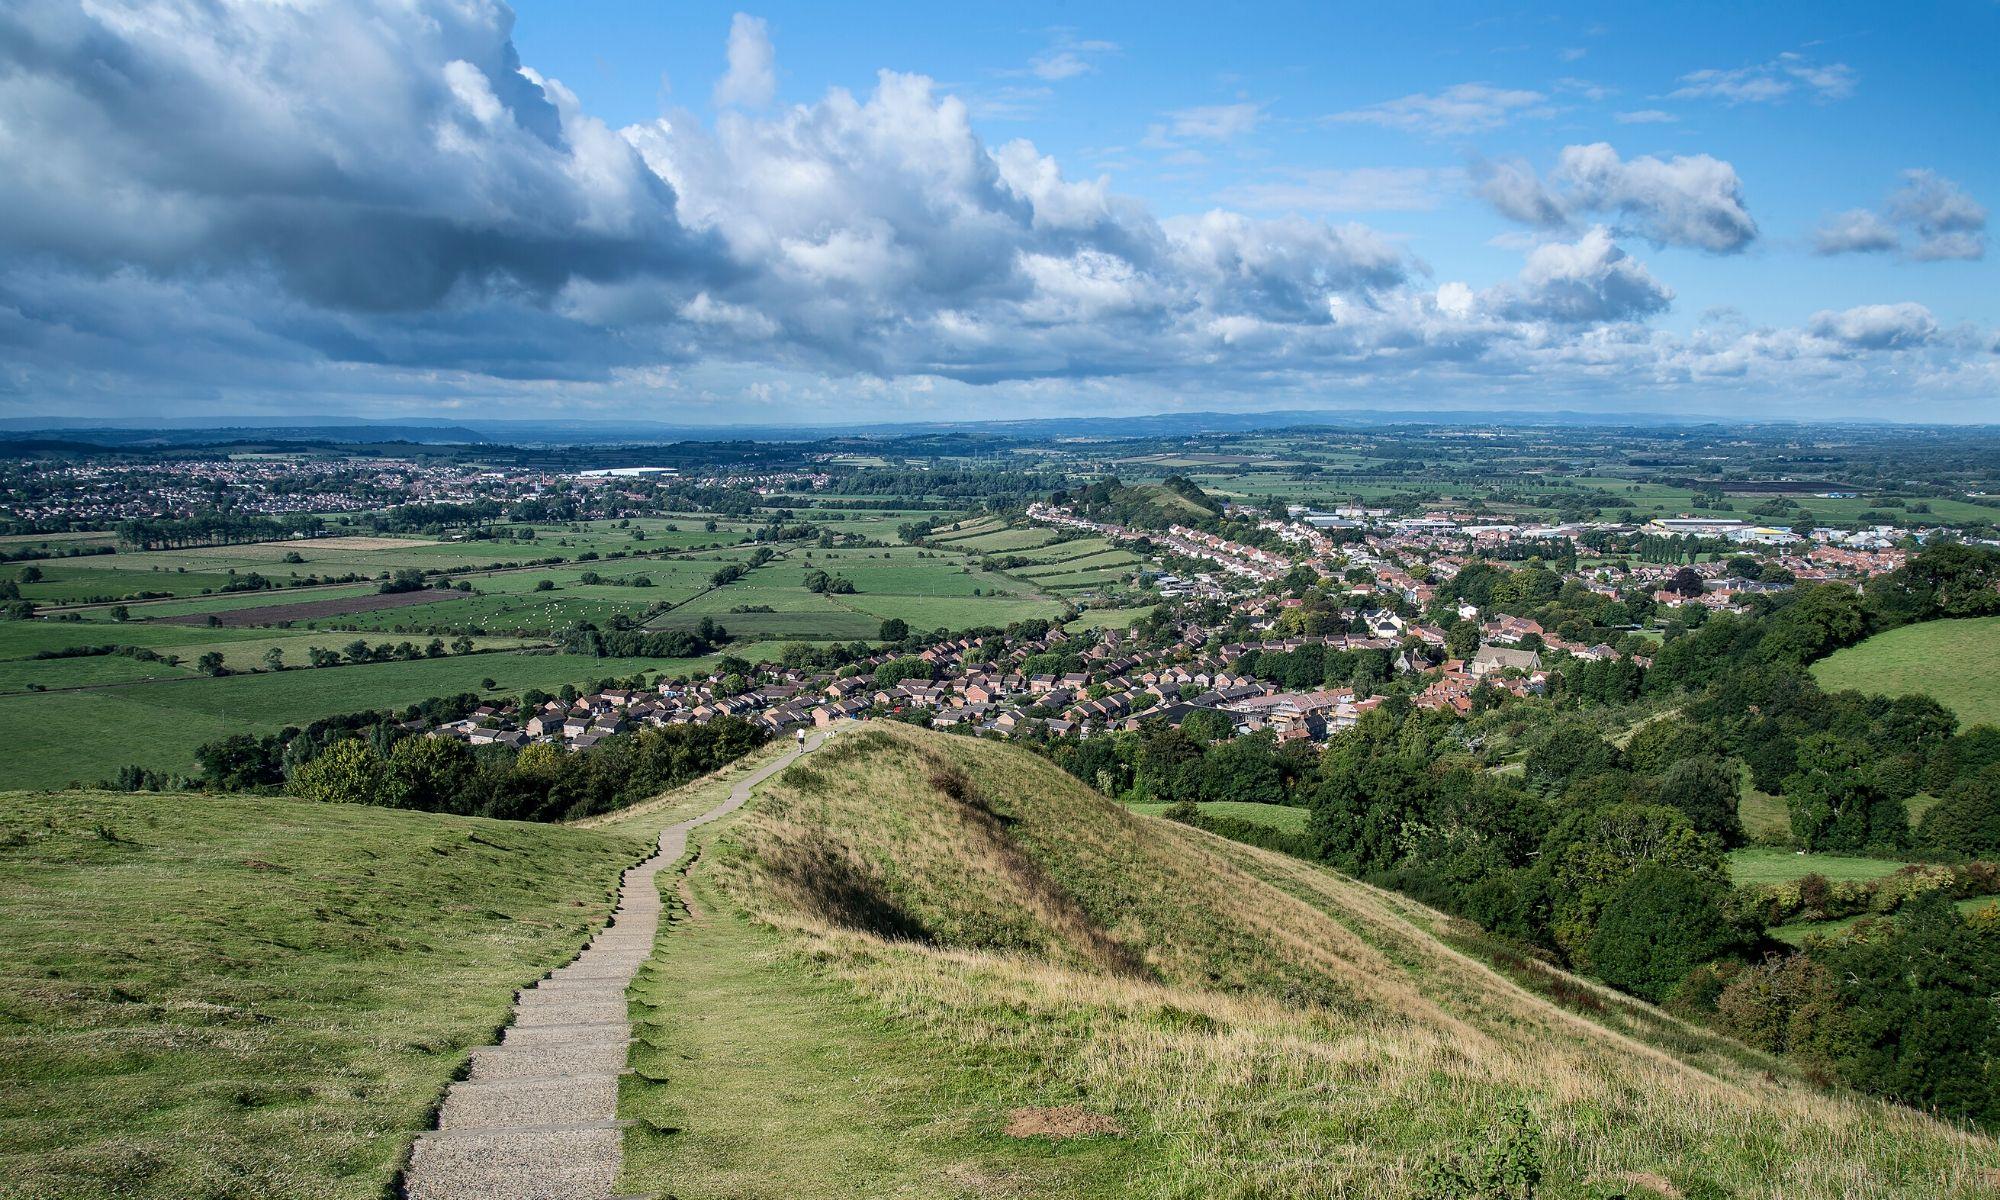 Glastonbury - A Pesticide-Free Town Case Study